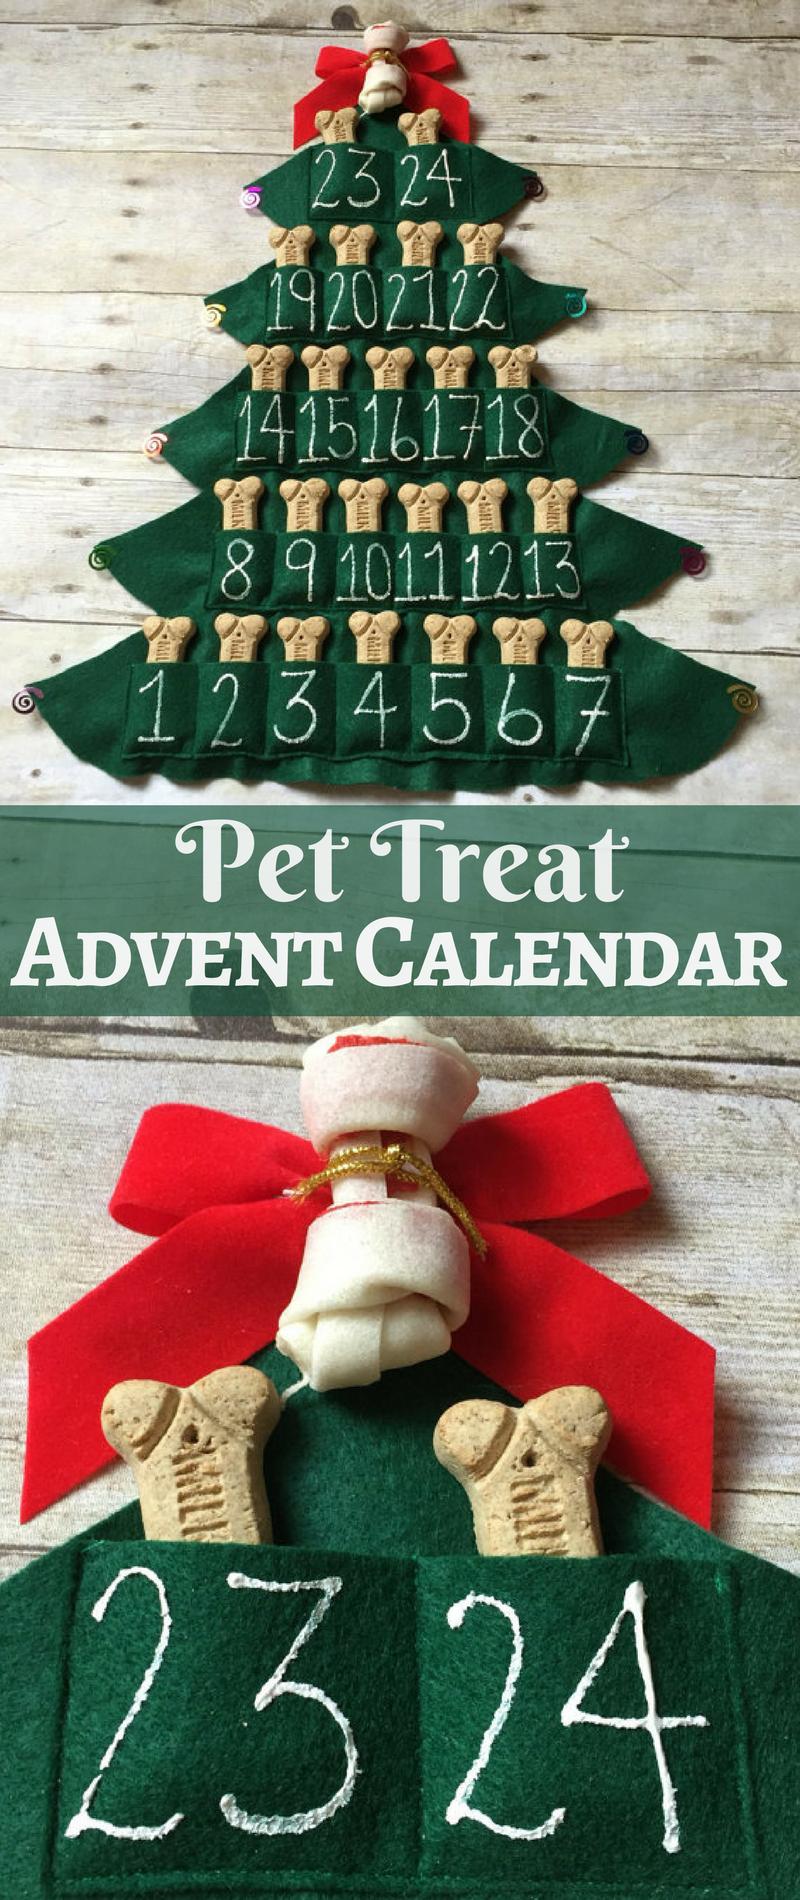 Pet Treat Advent Calendar, Felt Christmas Tree, 25